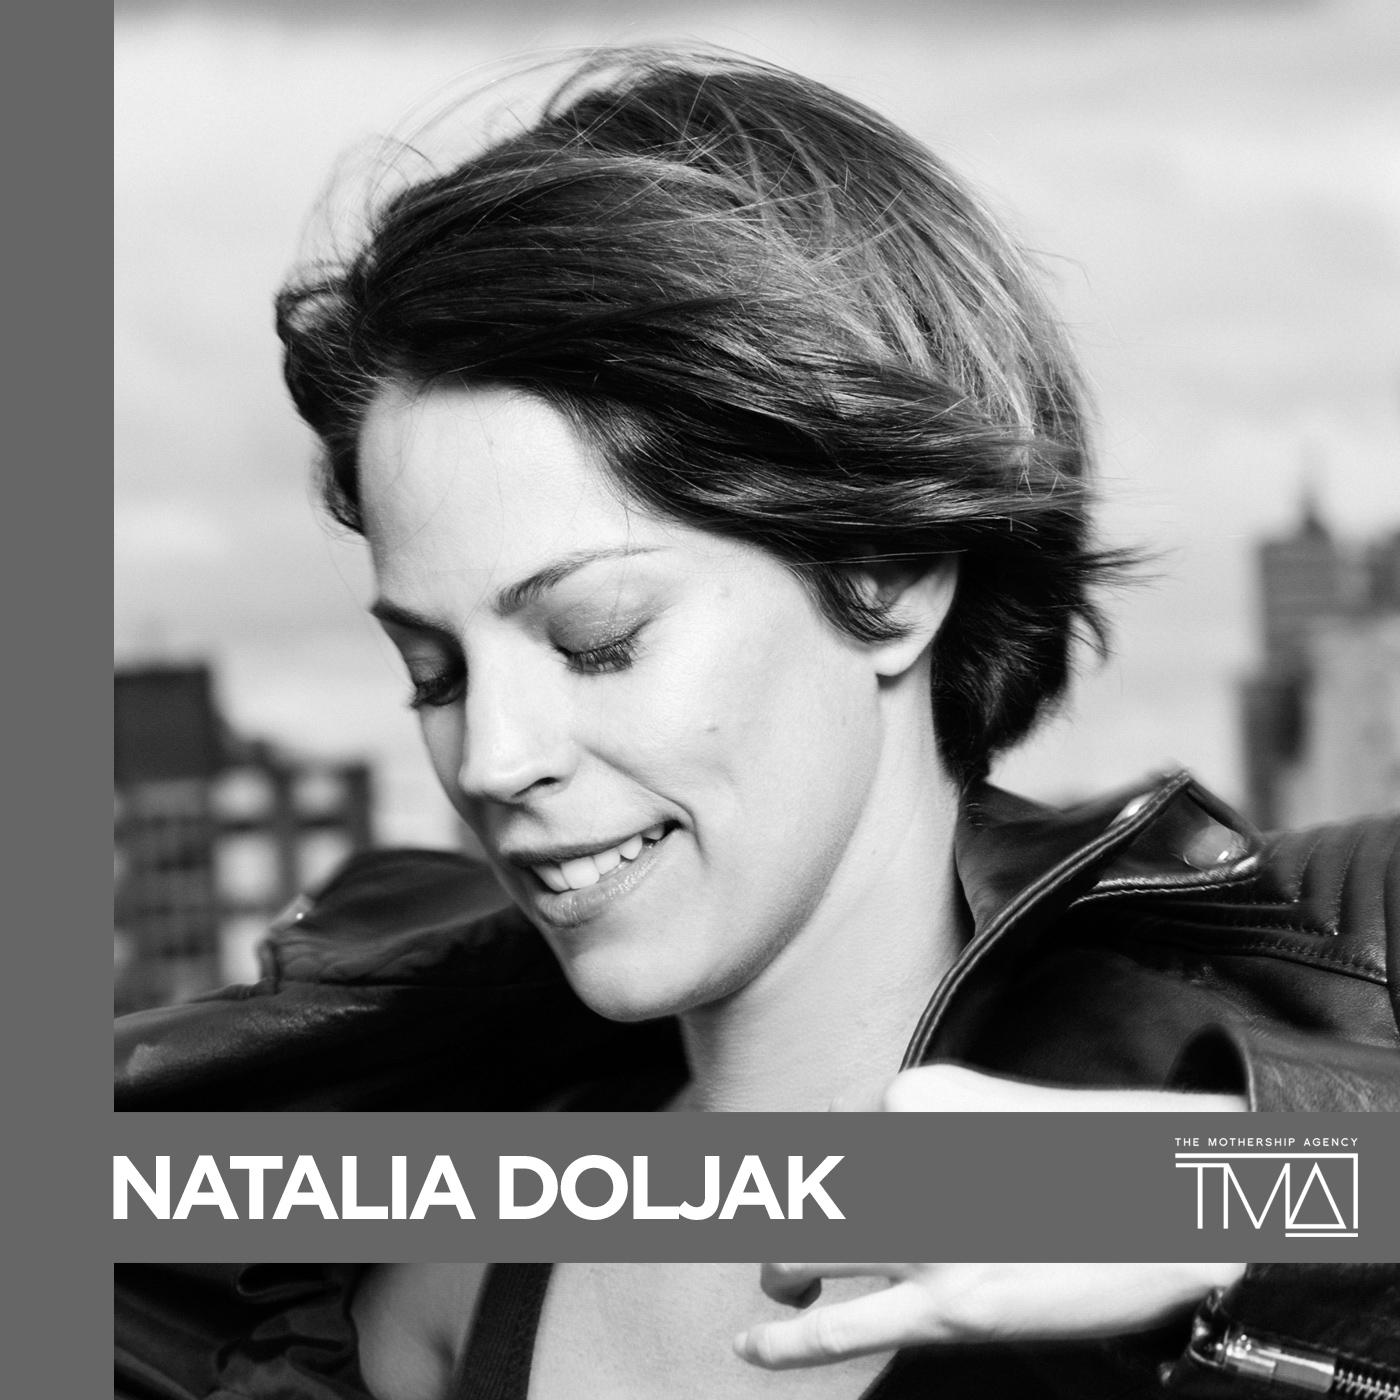 THE COLLECTIVE SERIES: TMA – Natalia Doljak